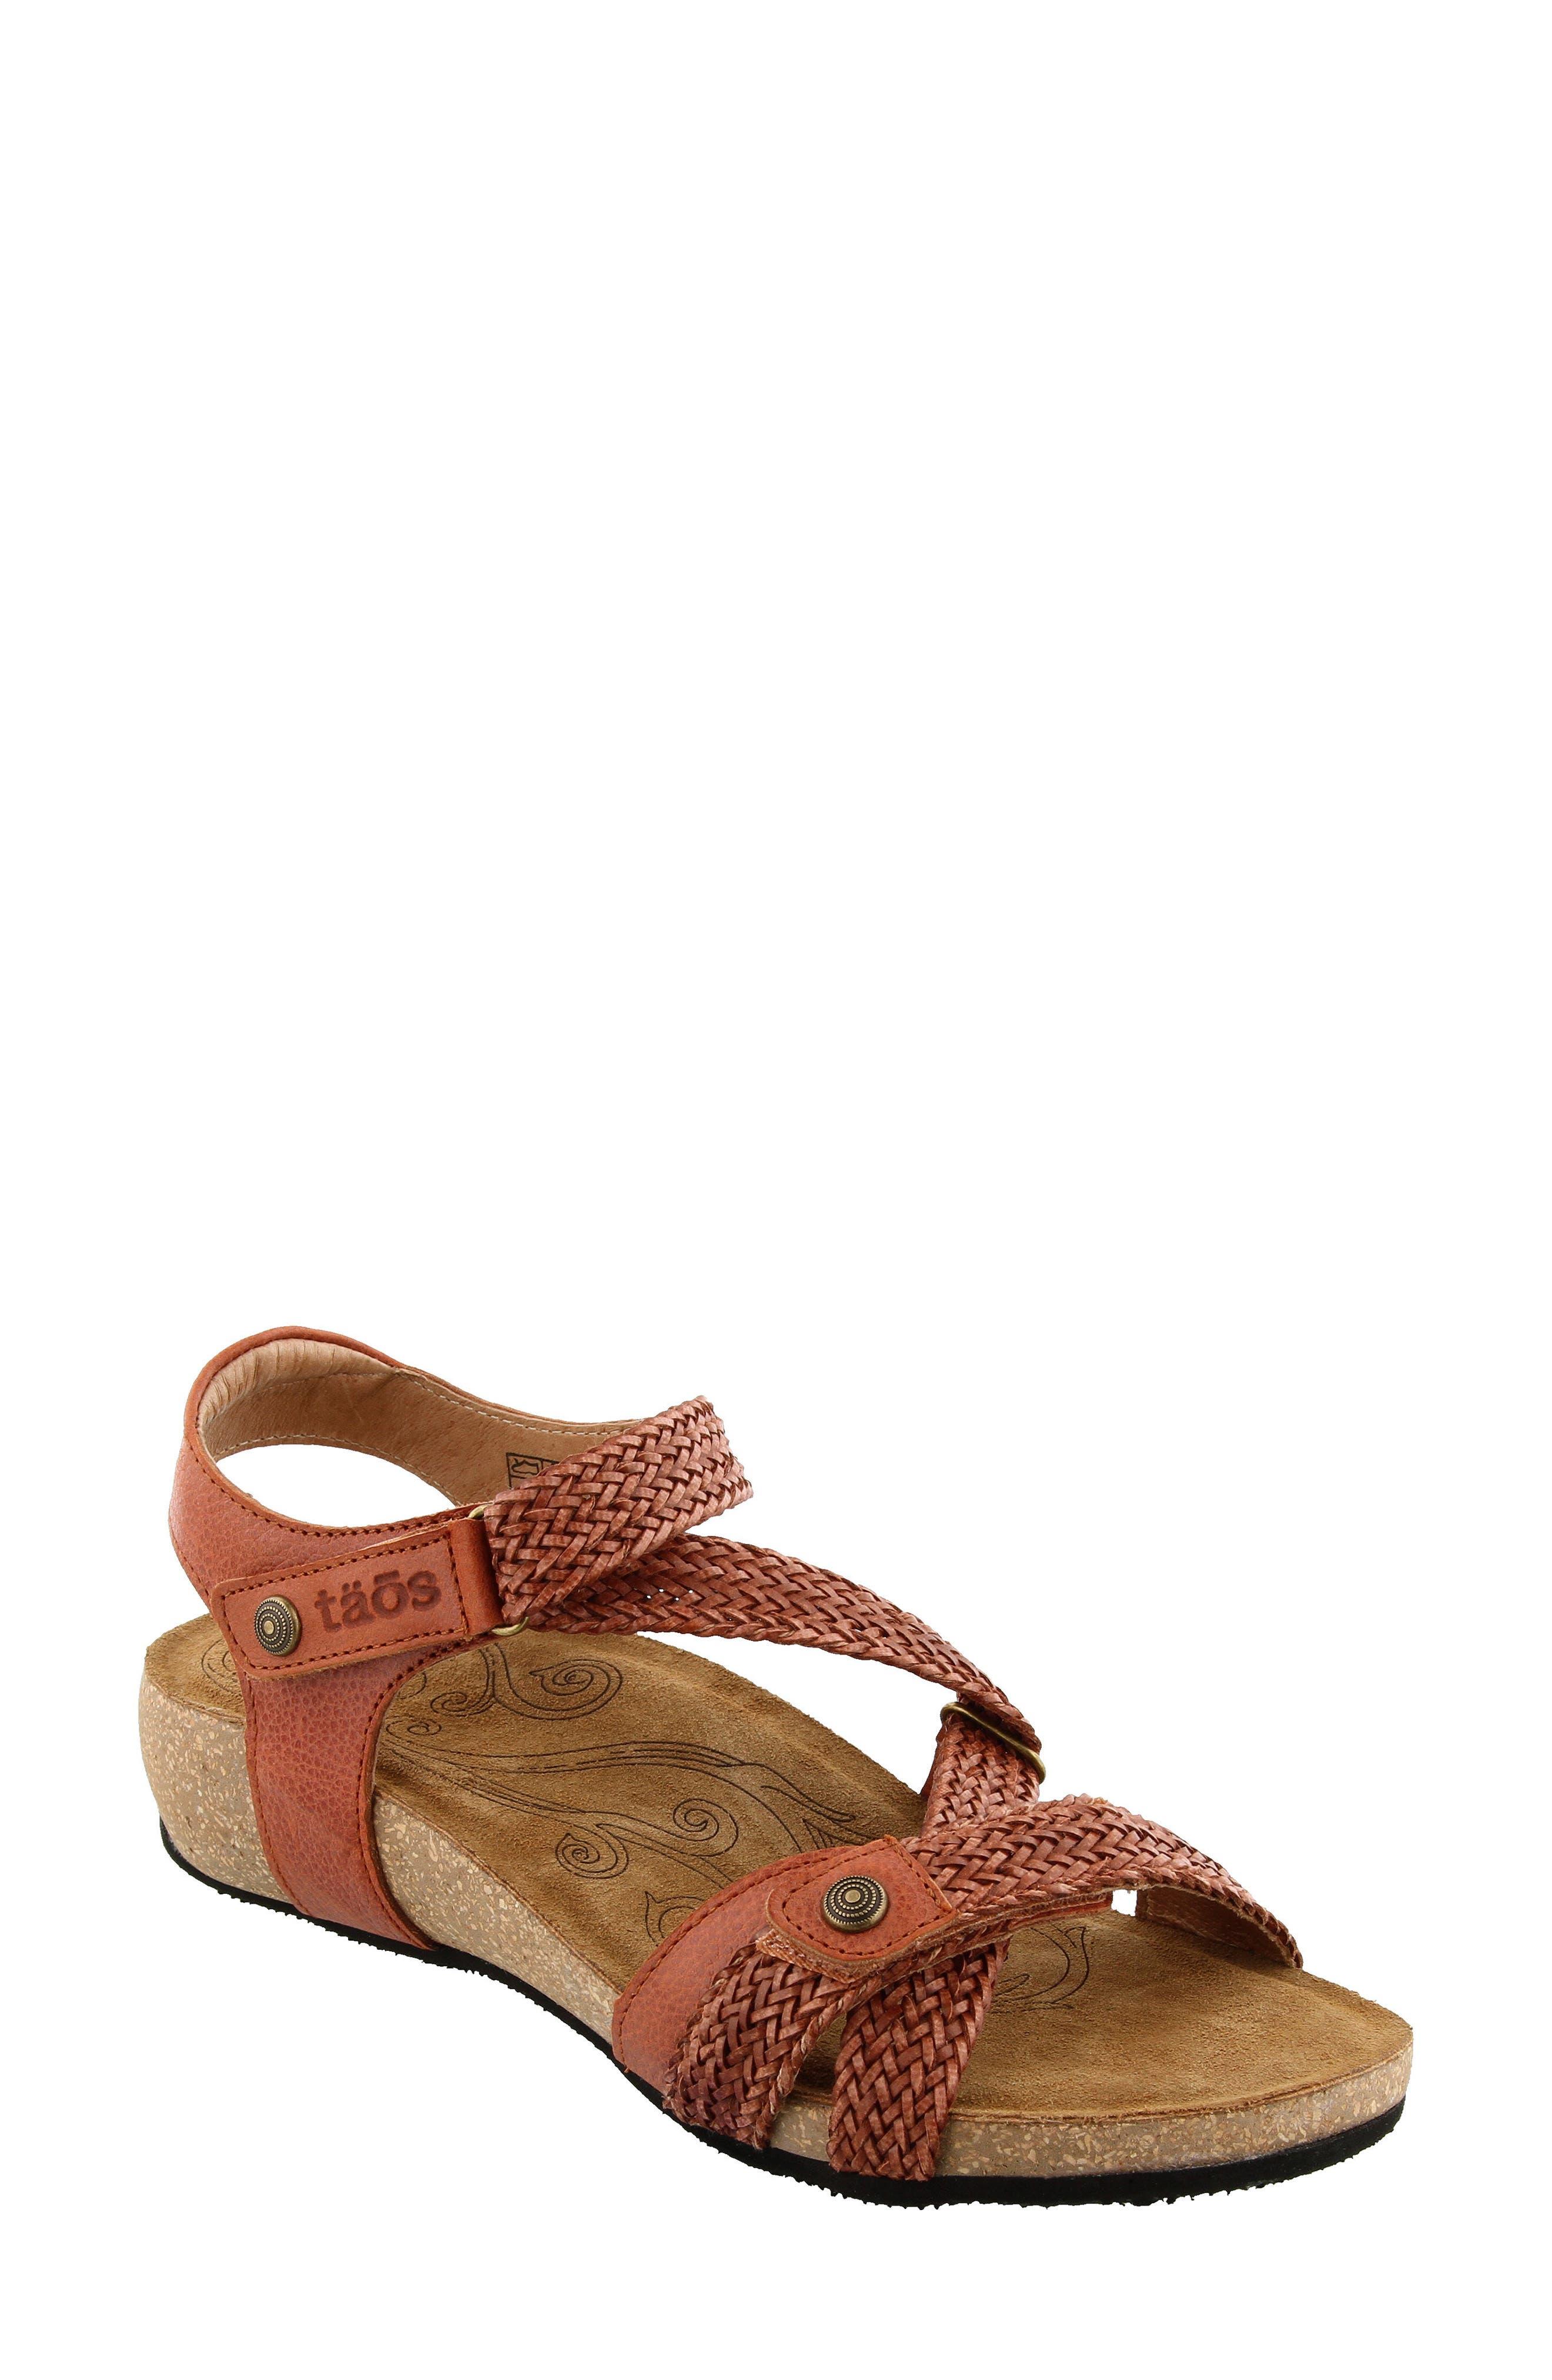 Alternate Image 1 Selected - Taos 'Trulie' Wedge Sandal (Women)